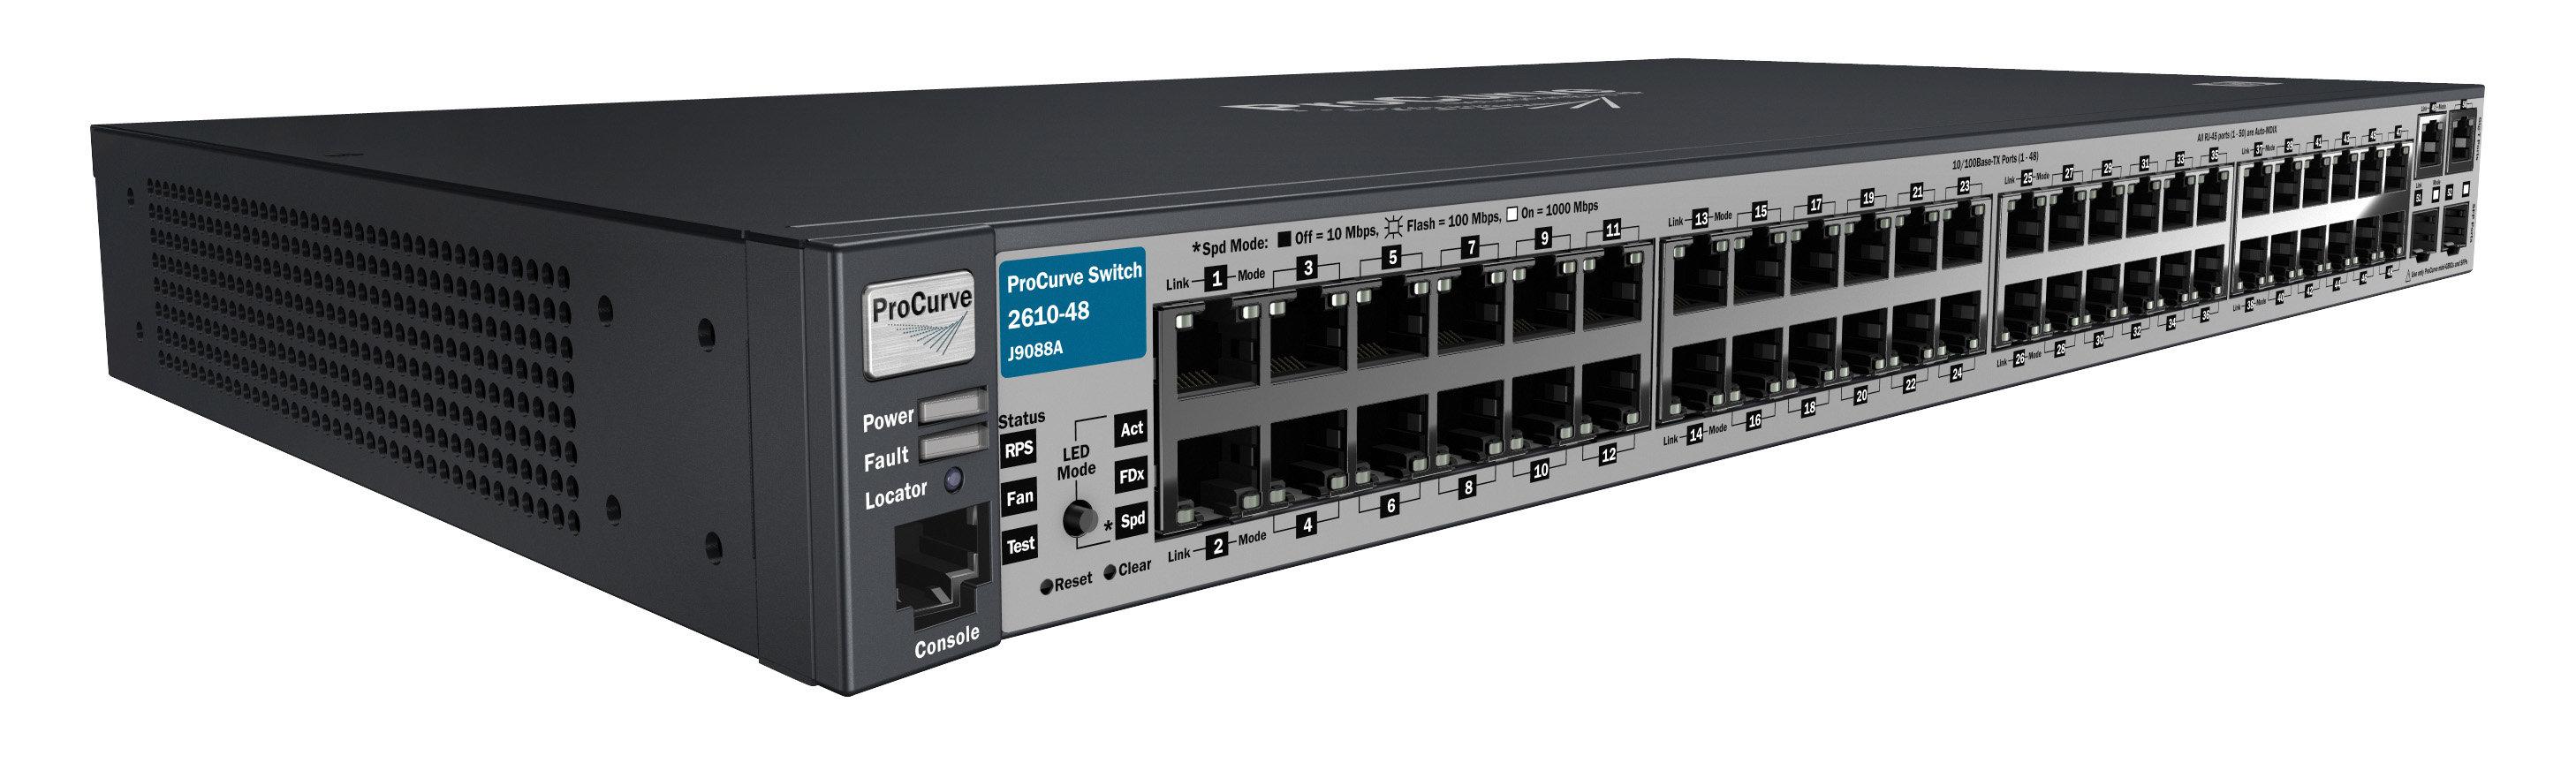 HP J9088A ProCurve 2610-48 Managed Switch